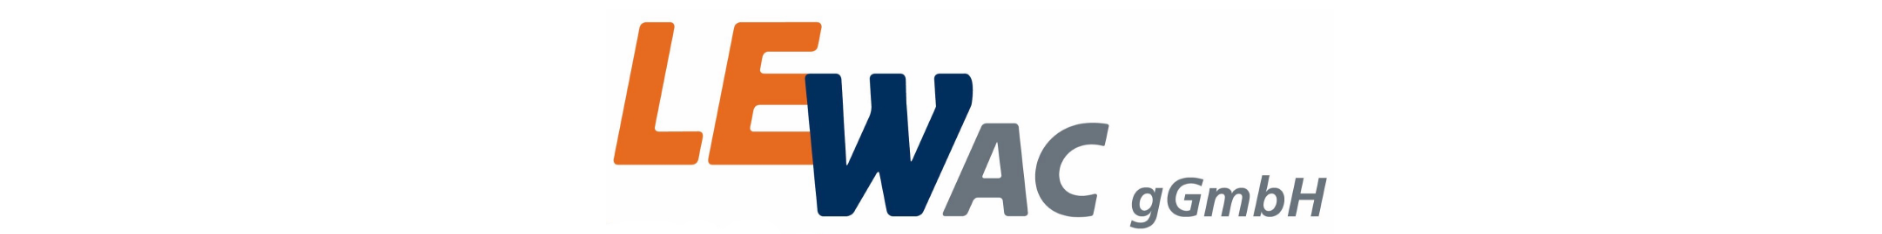 Lewac GmbH